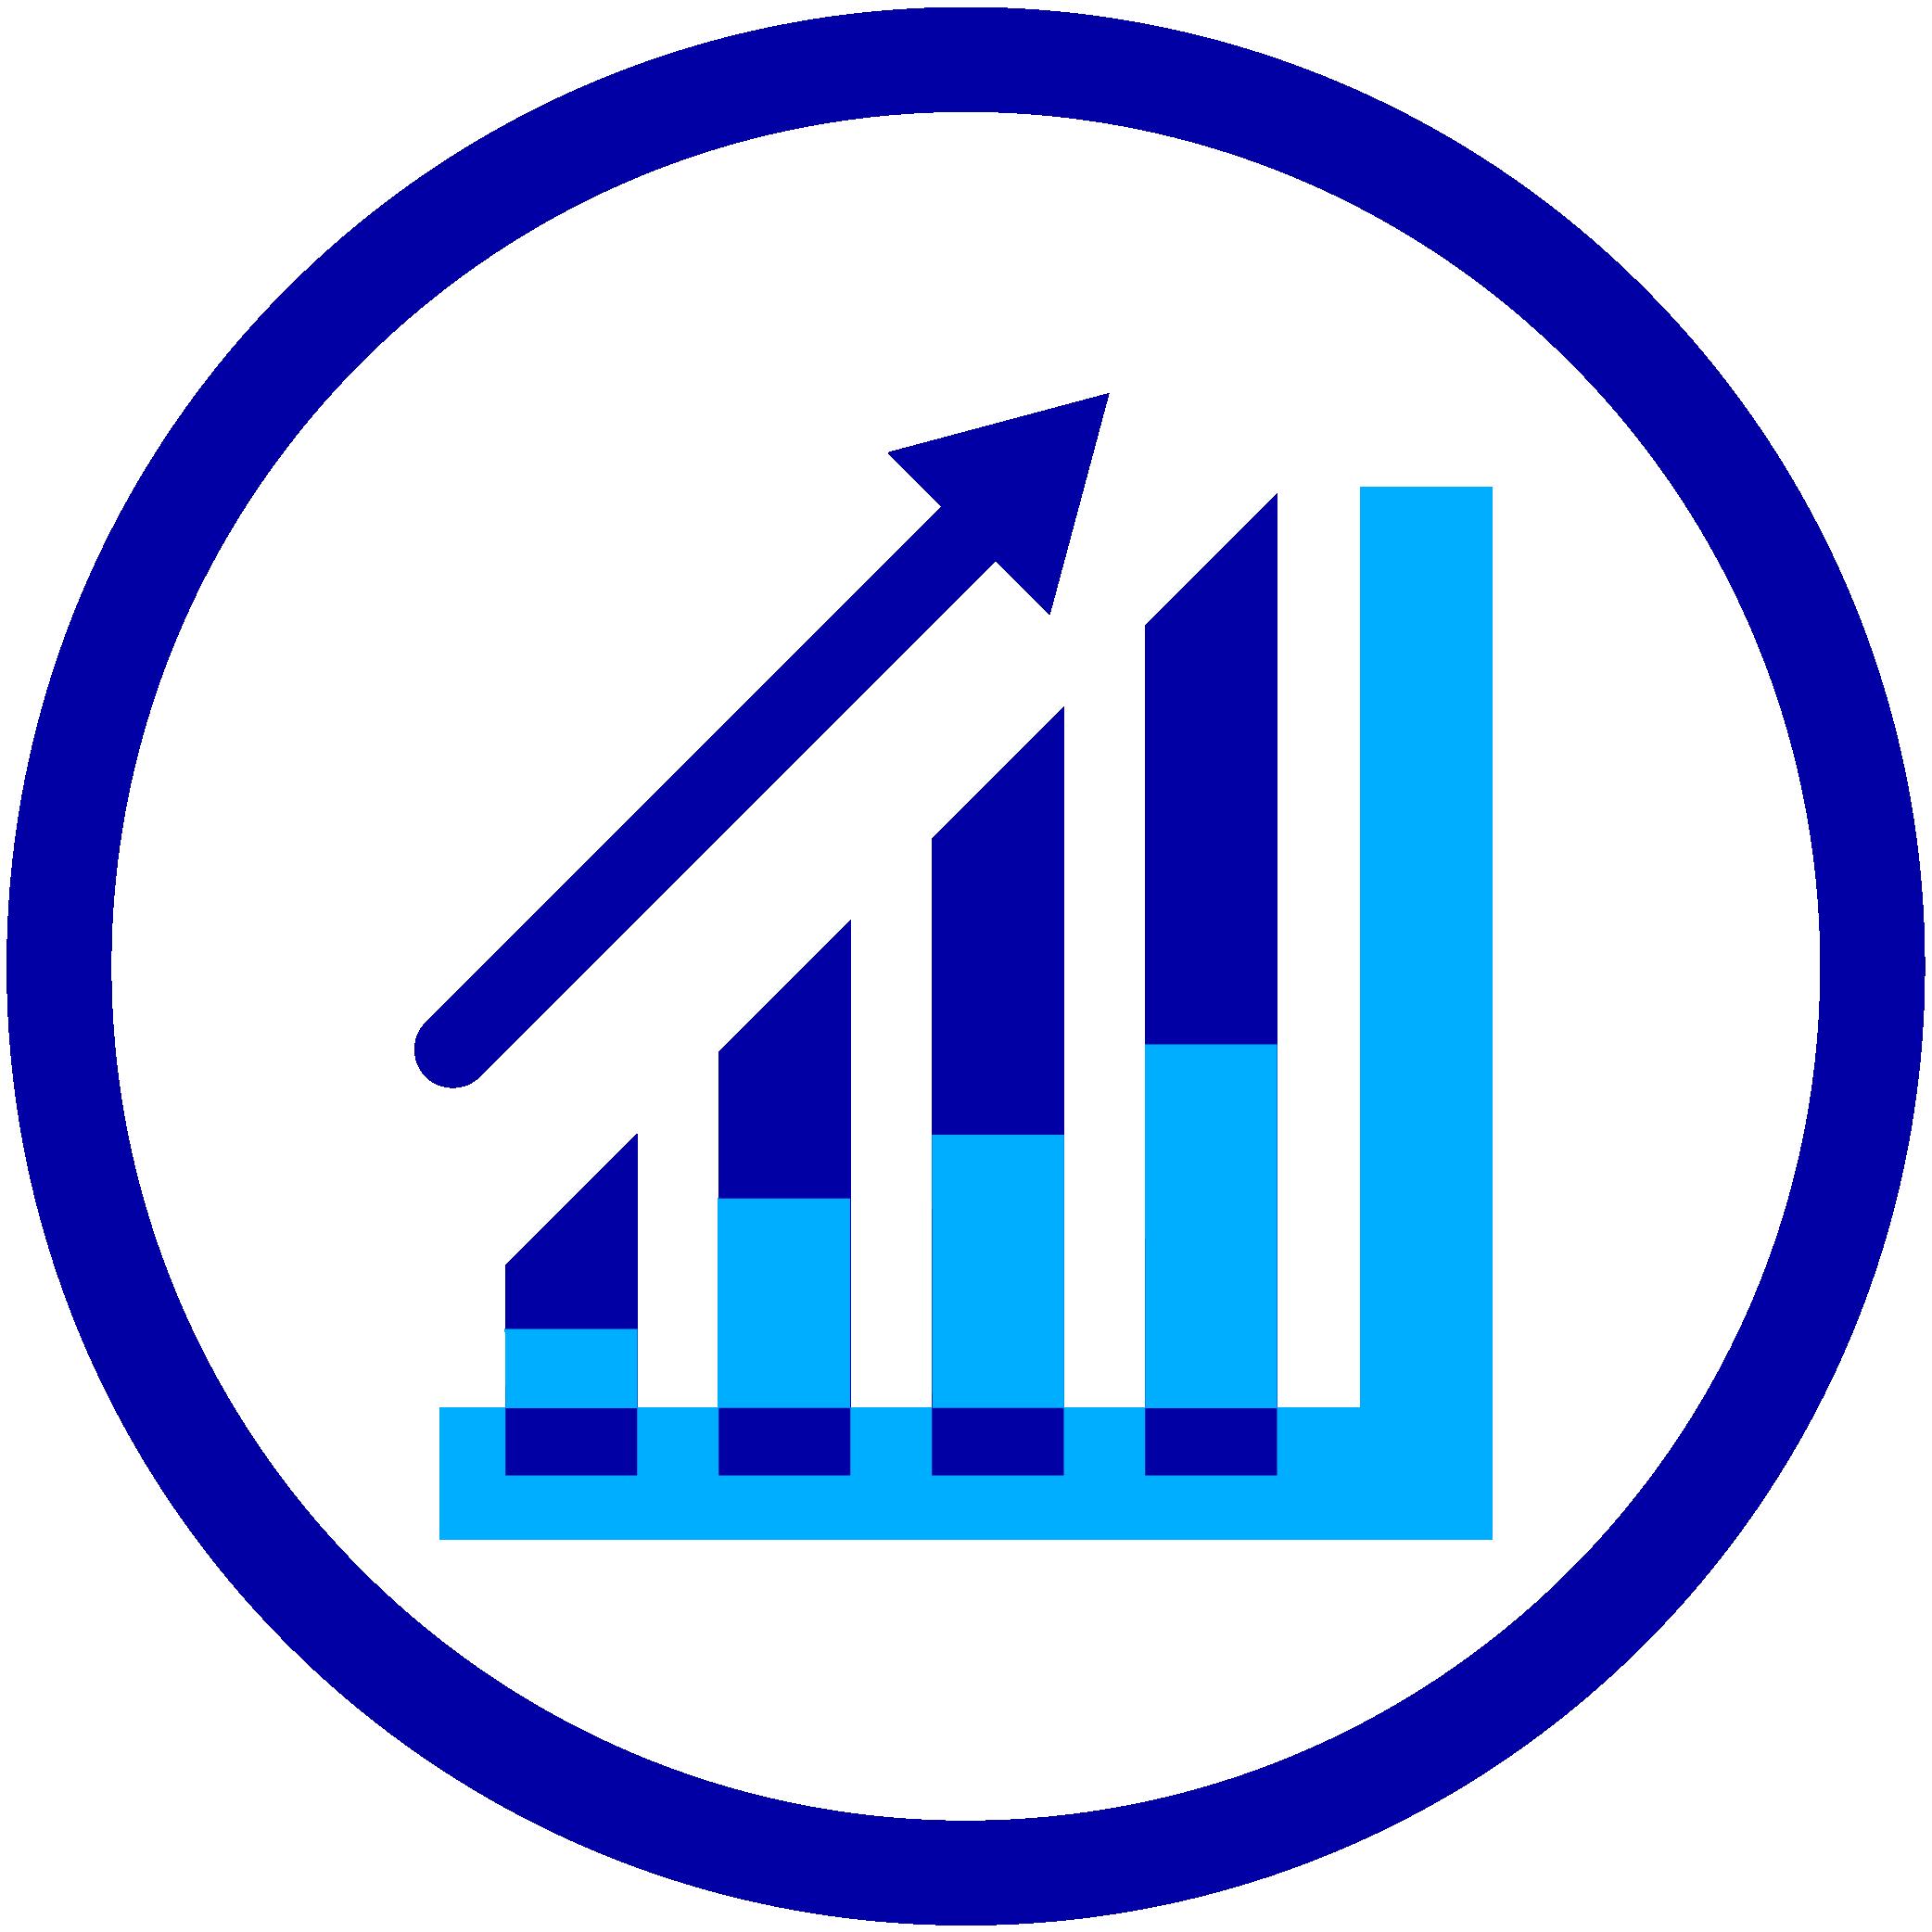 https://it.fi-group.com/wp-content/uploads/sites/10/2021/02/blue-icons-set_1-56.png